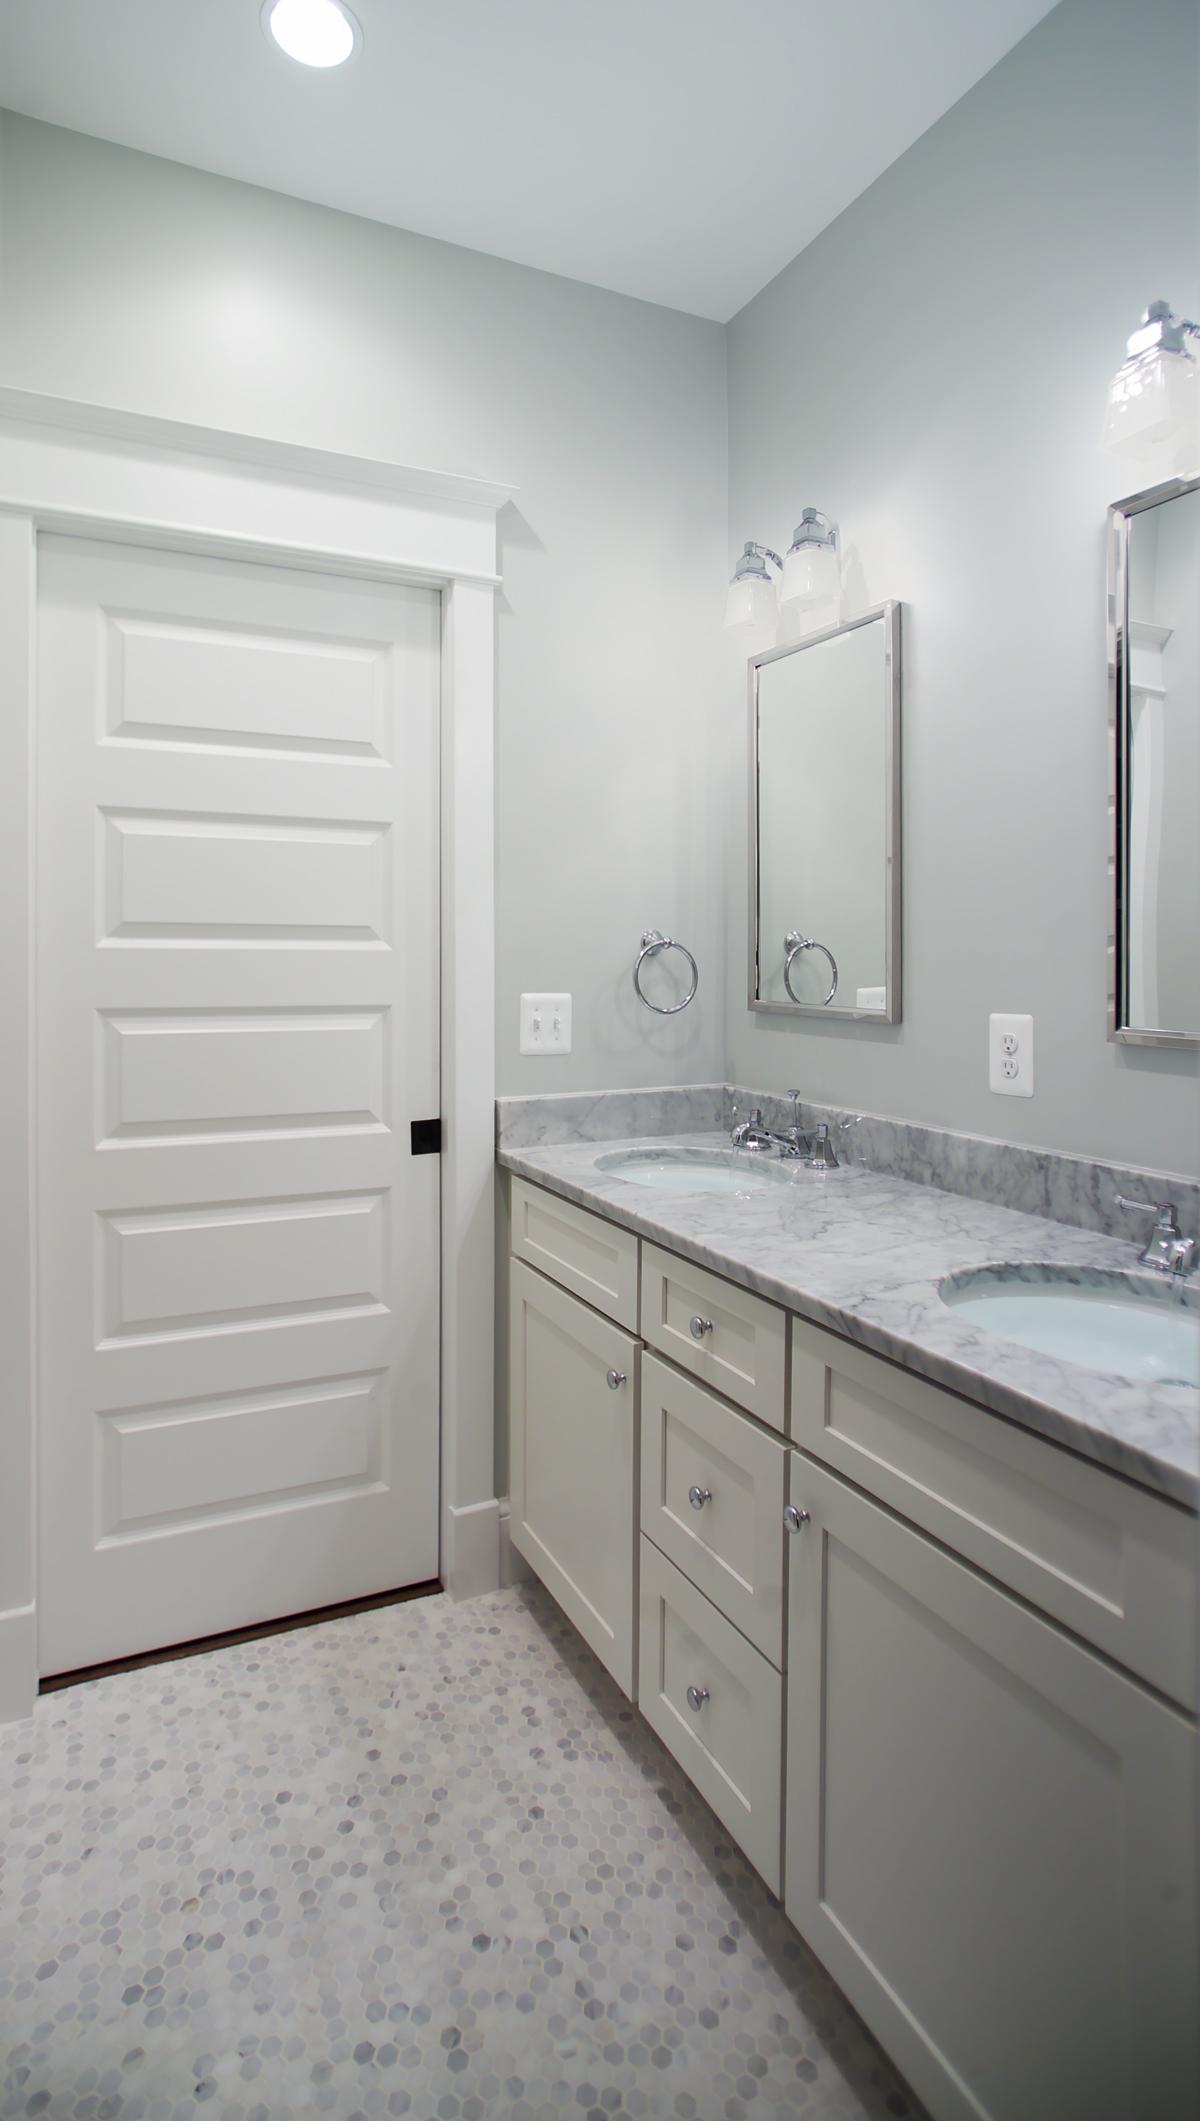 2nd Floor Guest Bathroom - Overall View.jpg